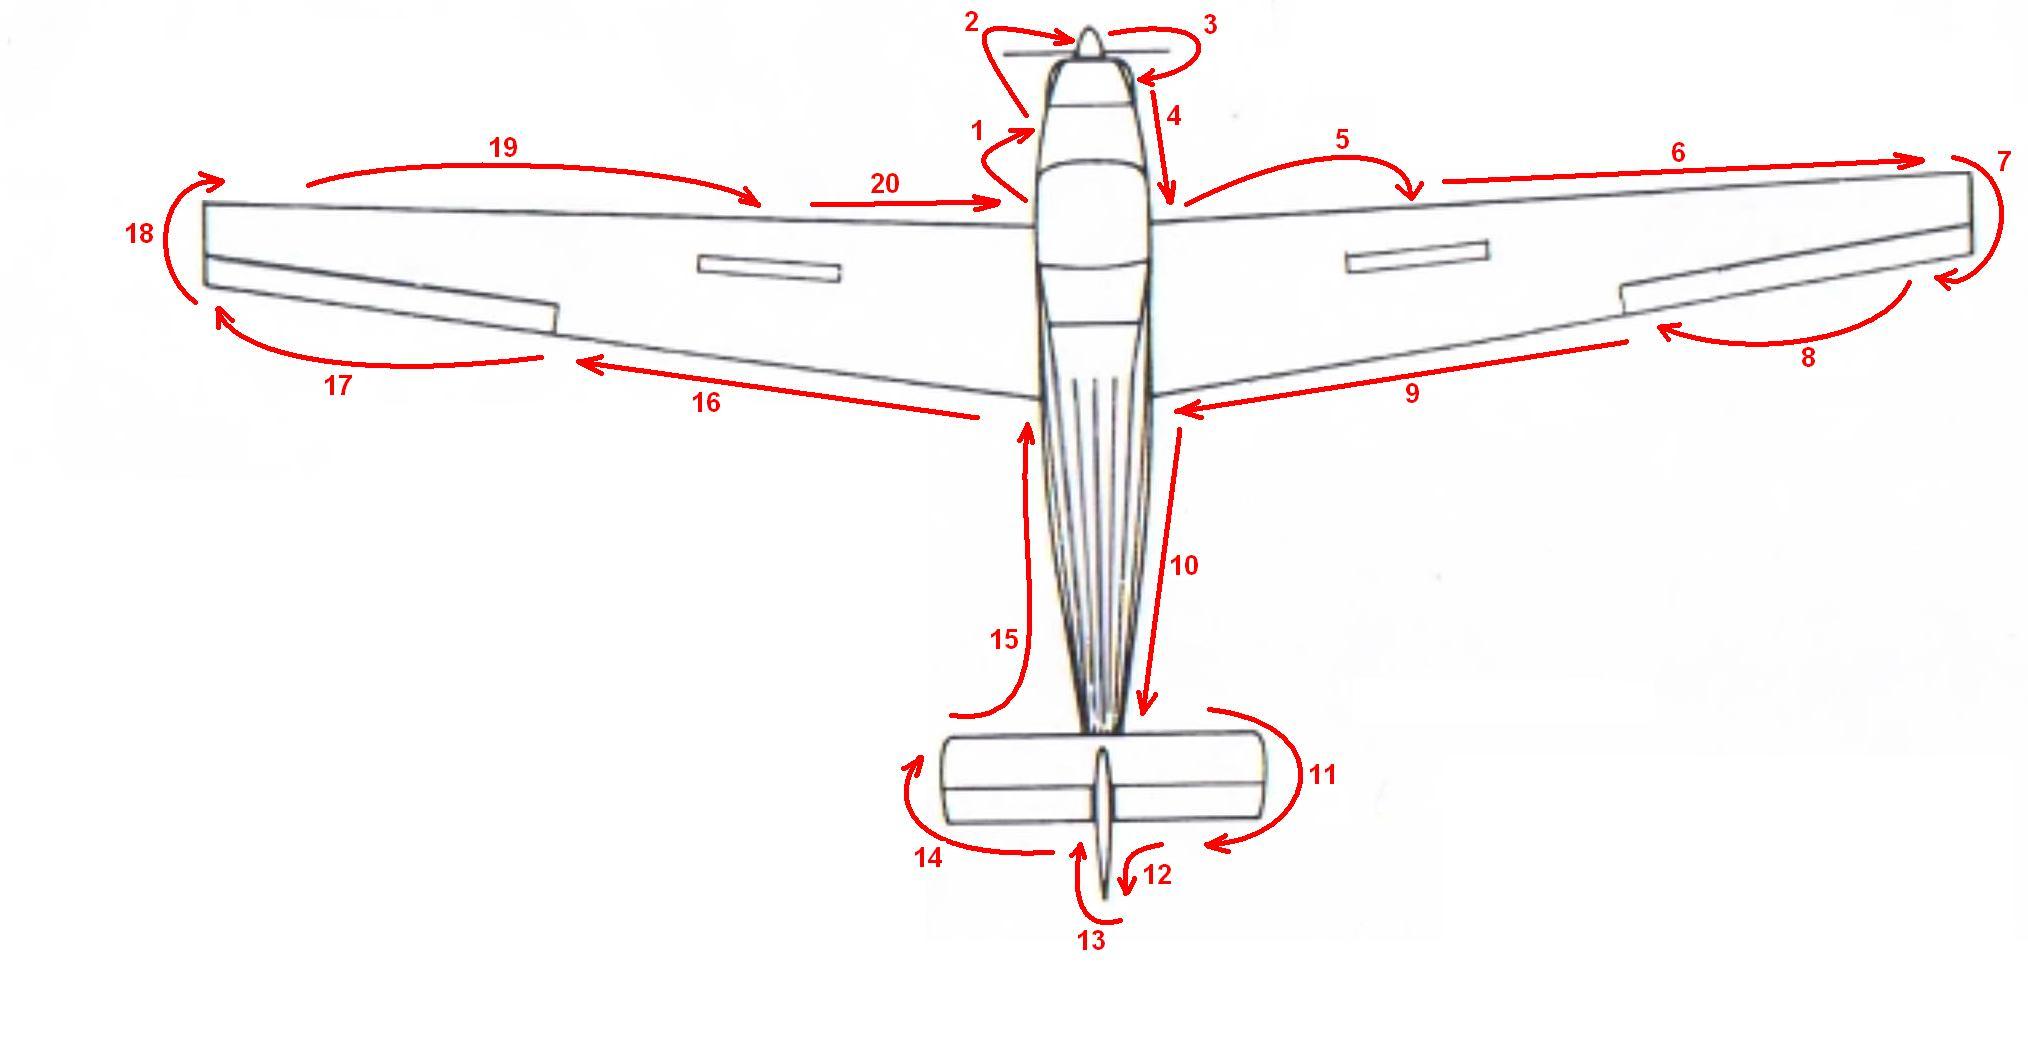 SF 25 falke pre-flight preparation